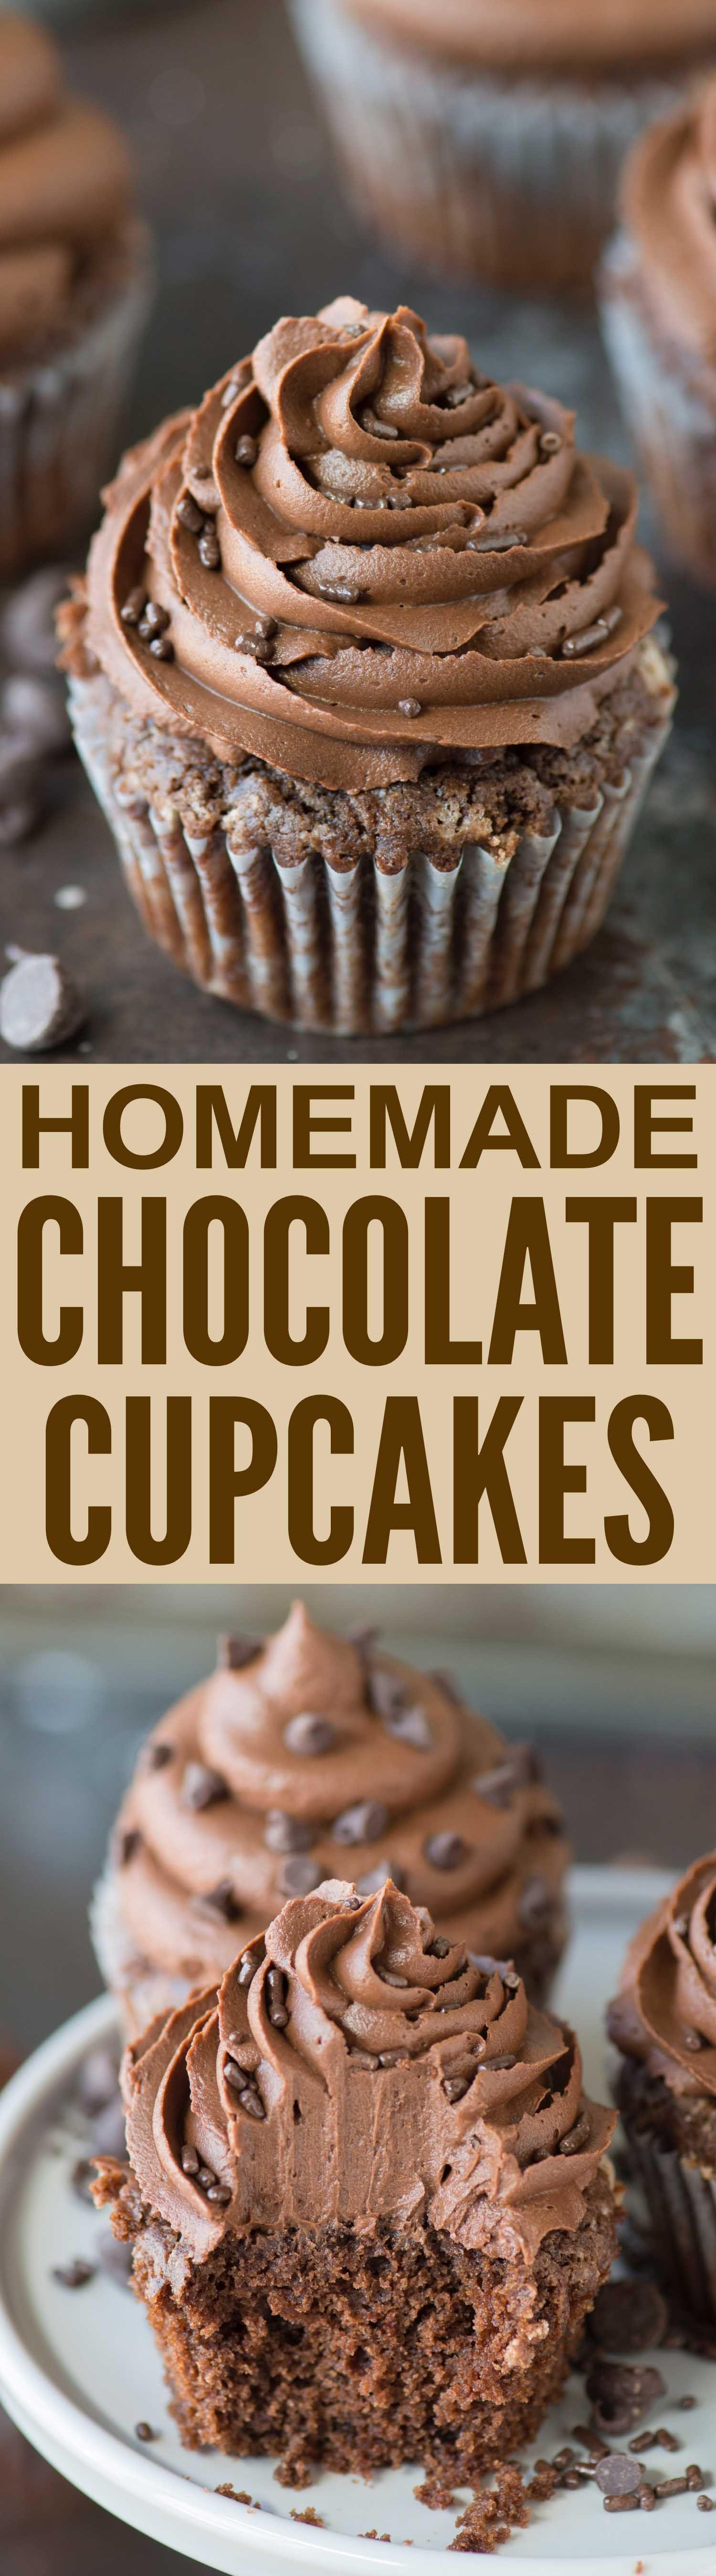 Chocolate Cupcakes | Recipe | Homemade, Homemade chocolate and ...